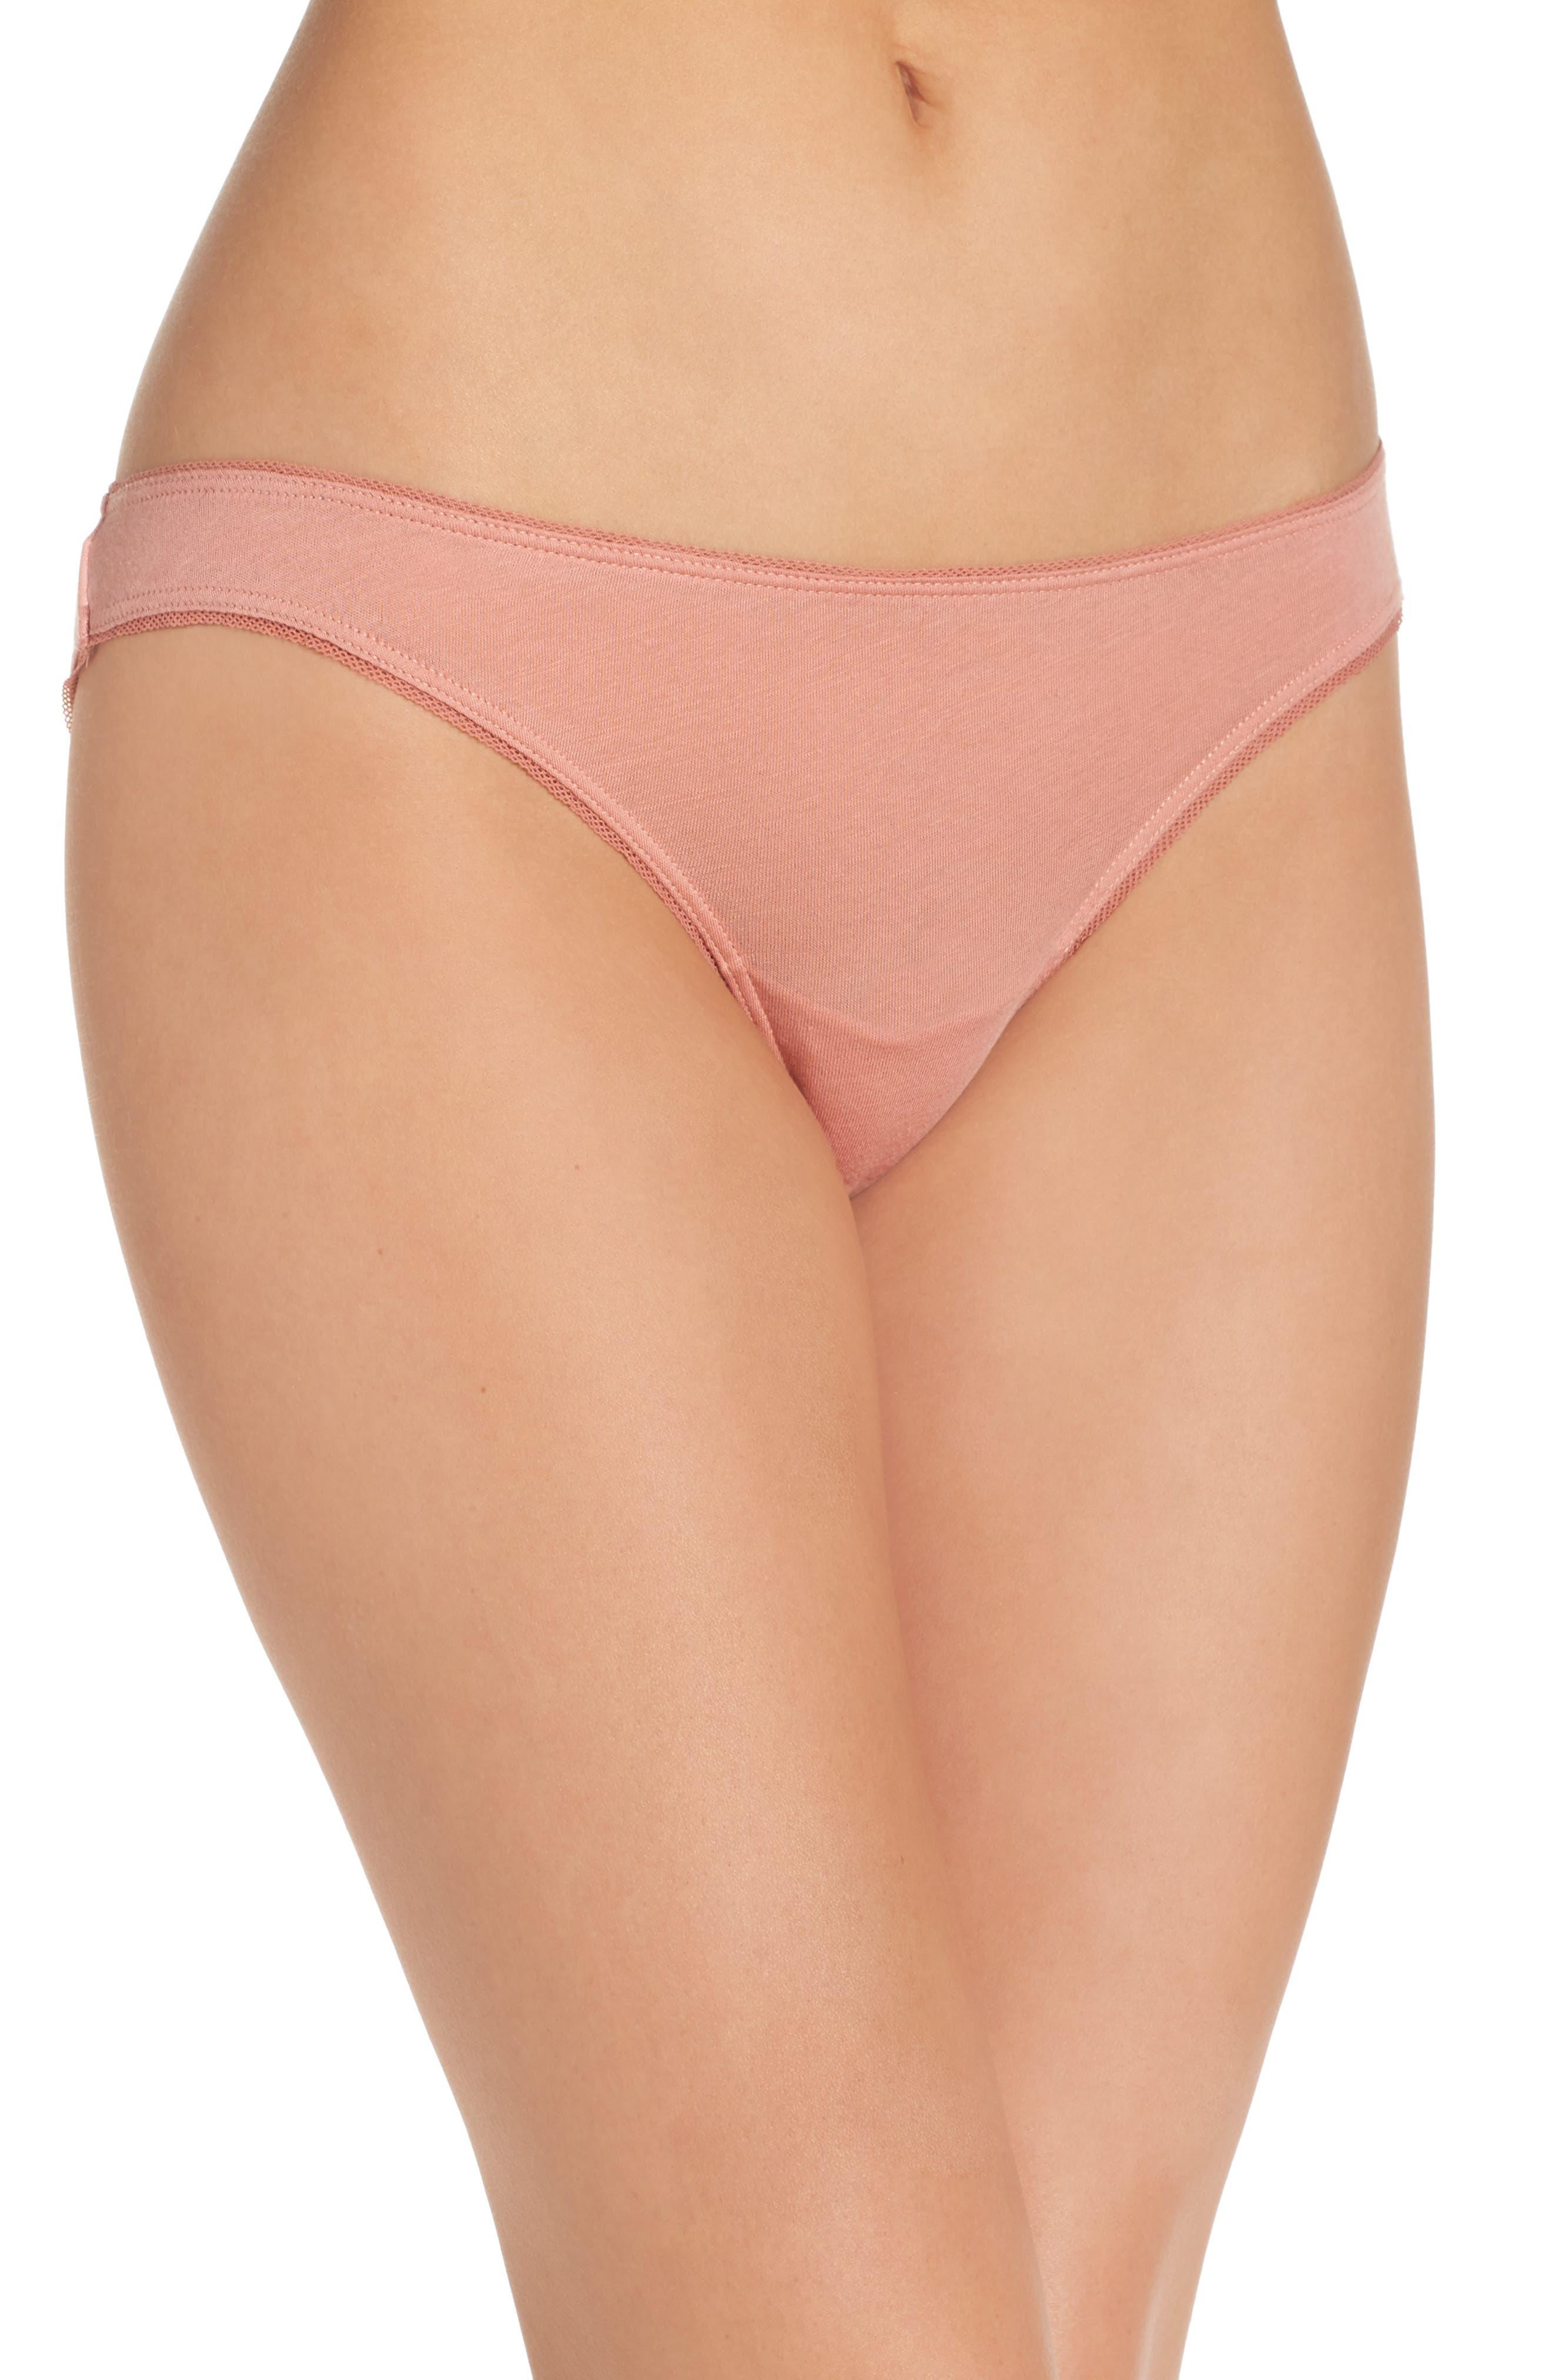 Organic Cotton Bikini,                             Main thumbnail 1, color,                             Vintage Pink